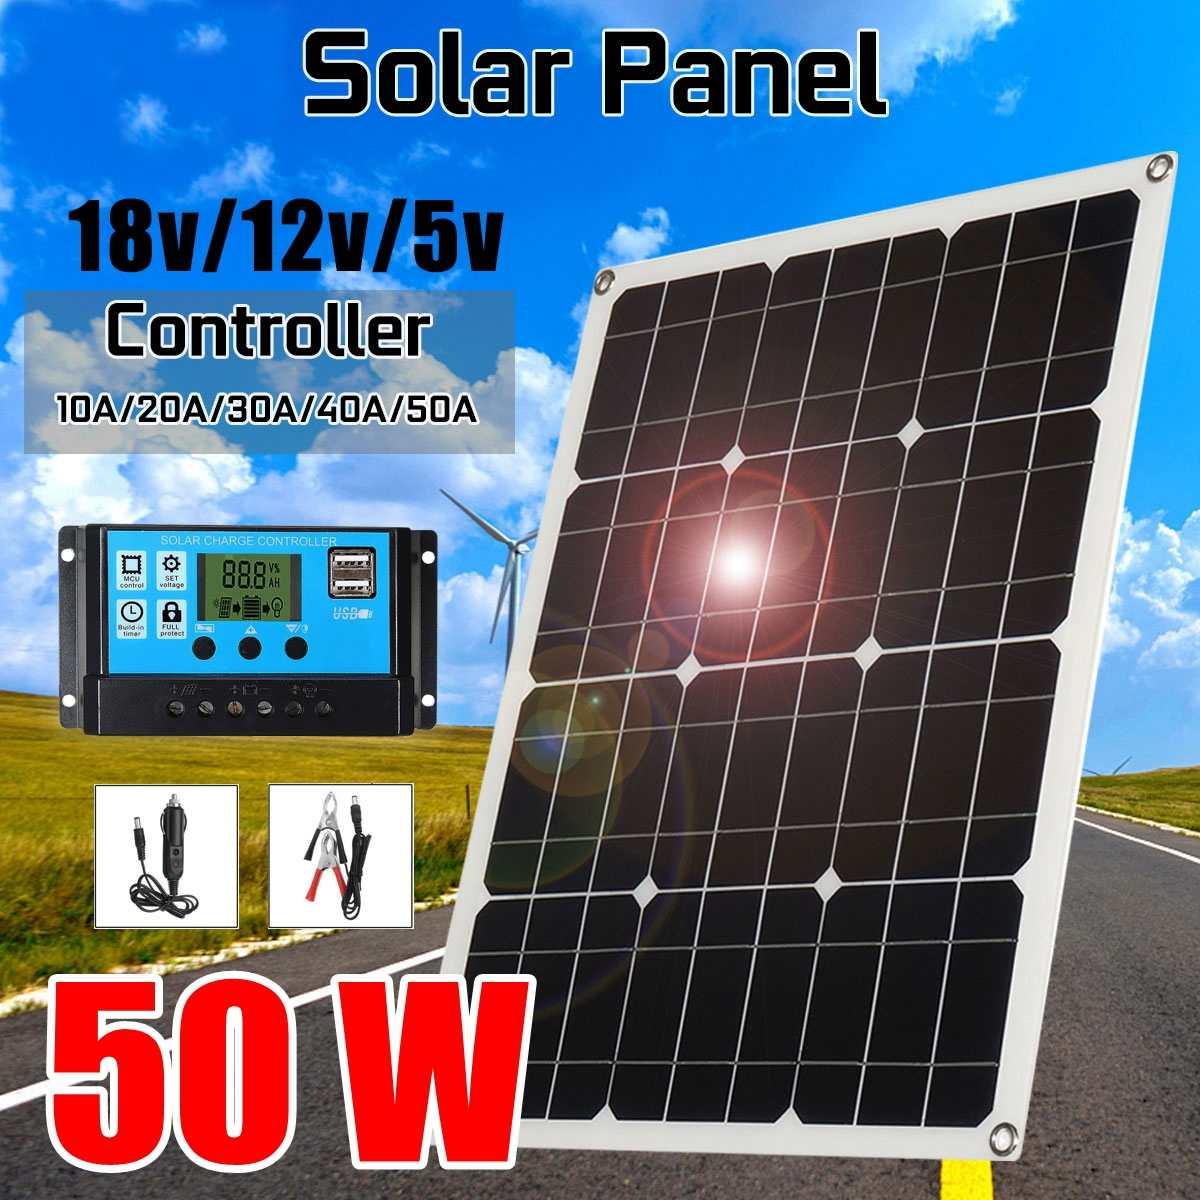 Solar Cells Charger 2USB Output Solar Panel Solar Cells Poly Solar Panel 10/20/30/40/50A Controller For Car Yacht 12V Battery